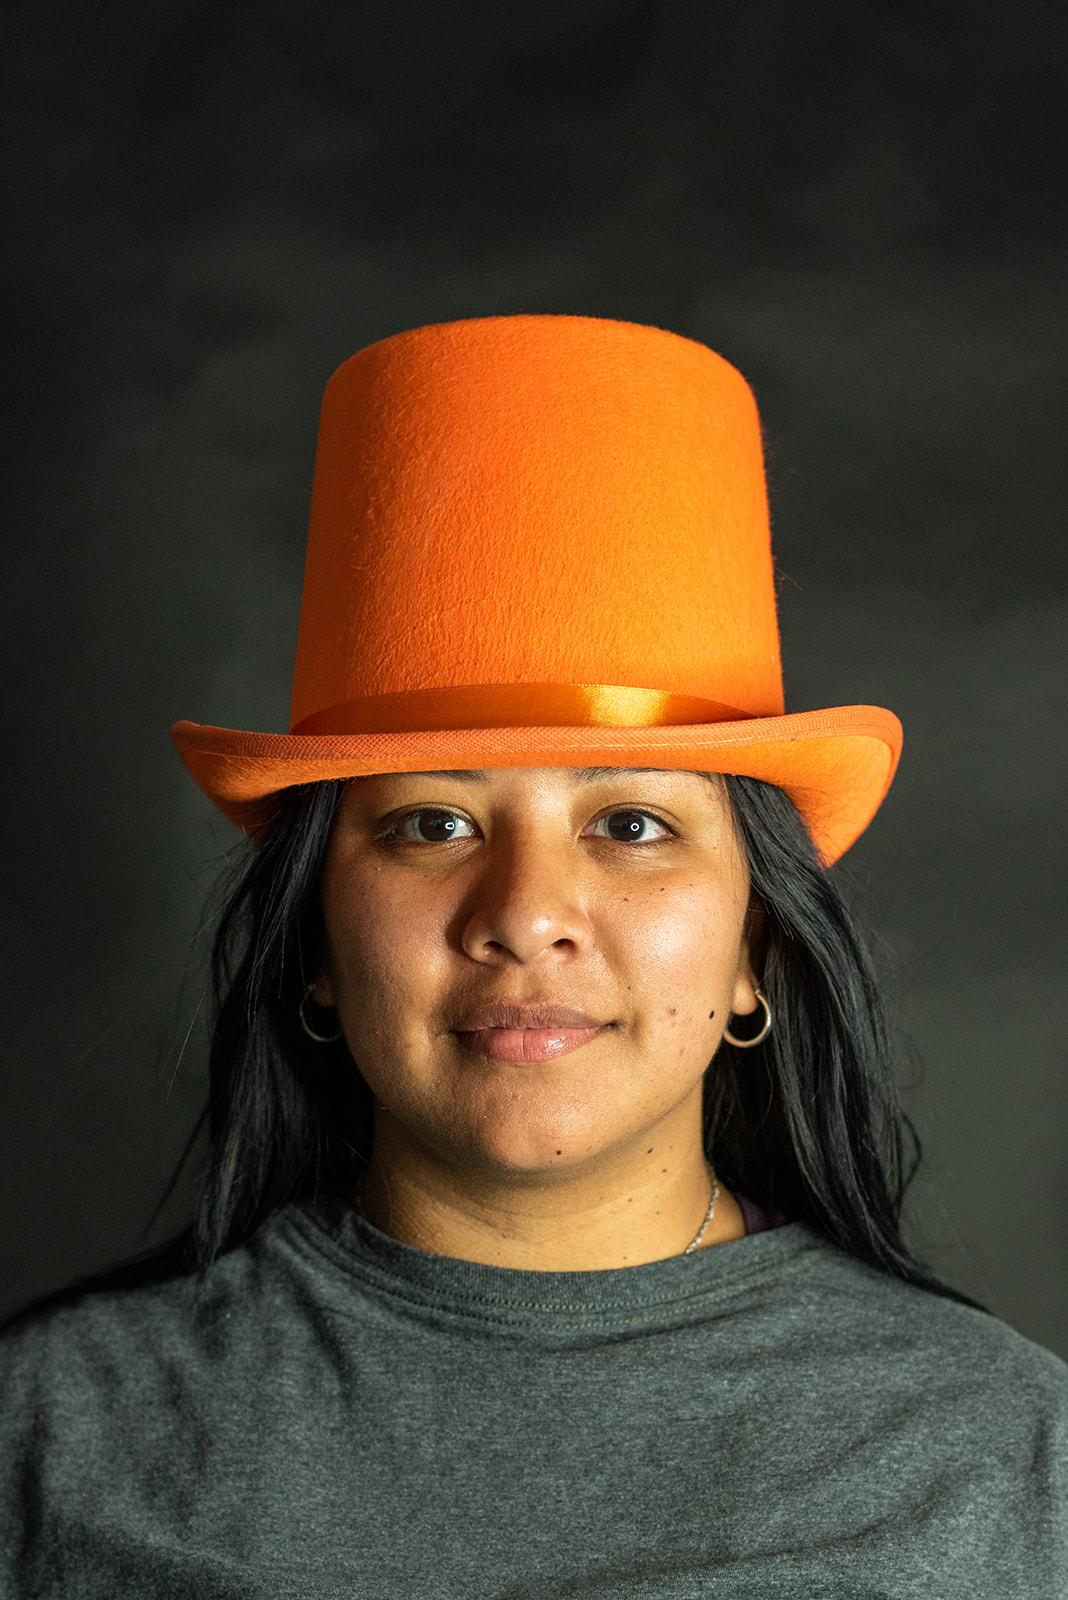 thumbnail 8 - Dumb and Dumber Orange Tall  Felt Top Hat Lloyd Christmas Costume Accessory